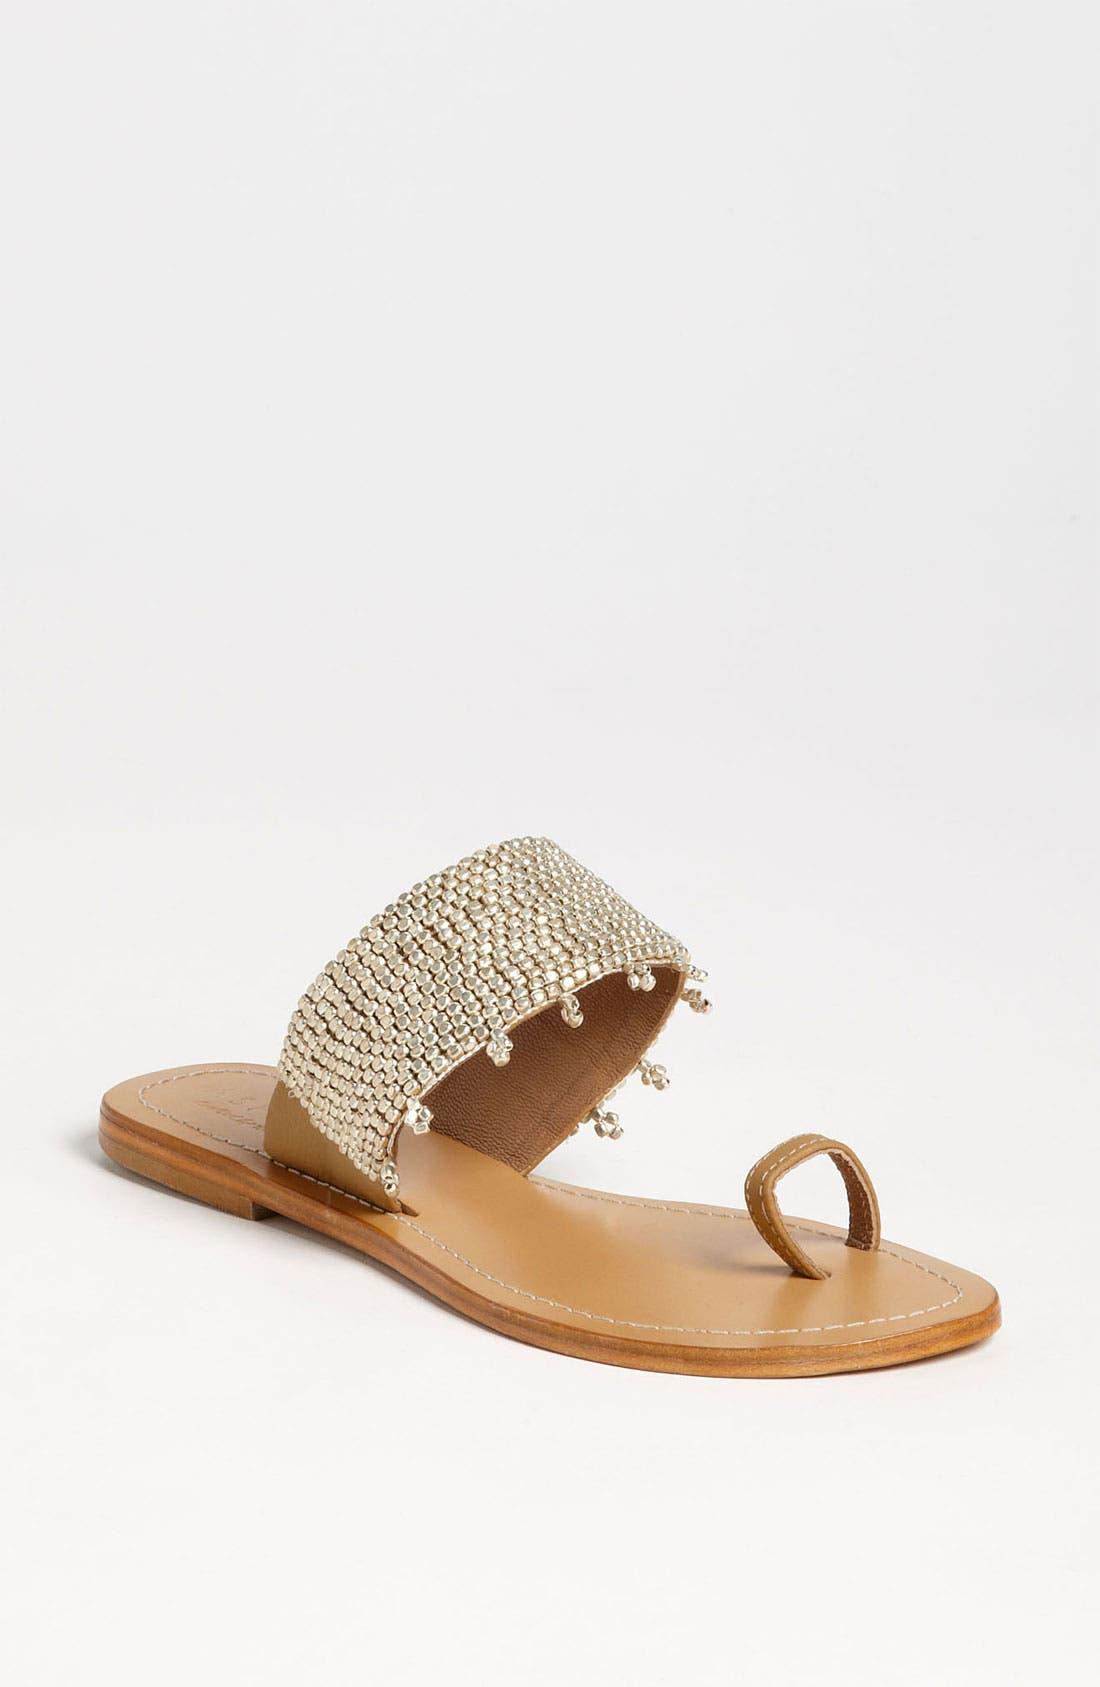 Alternate Image 1 Selected - Aspiga 'Luna' Sandal